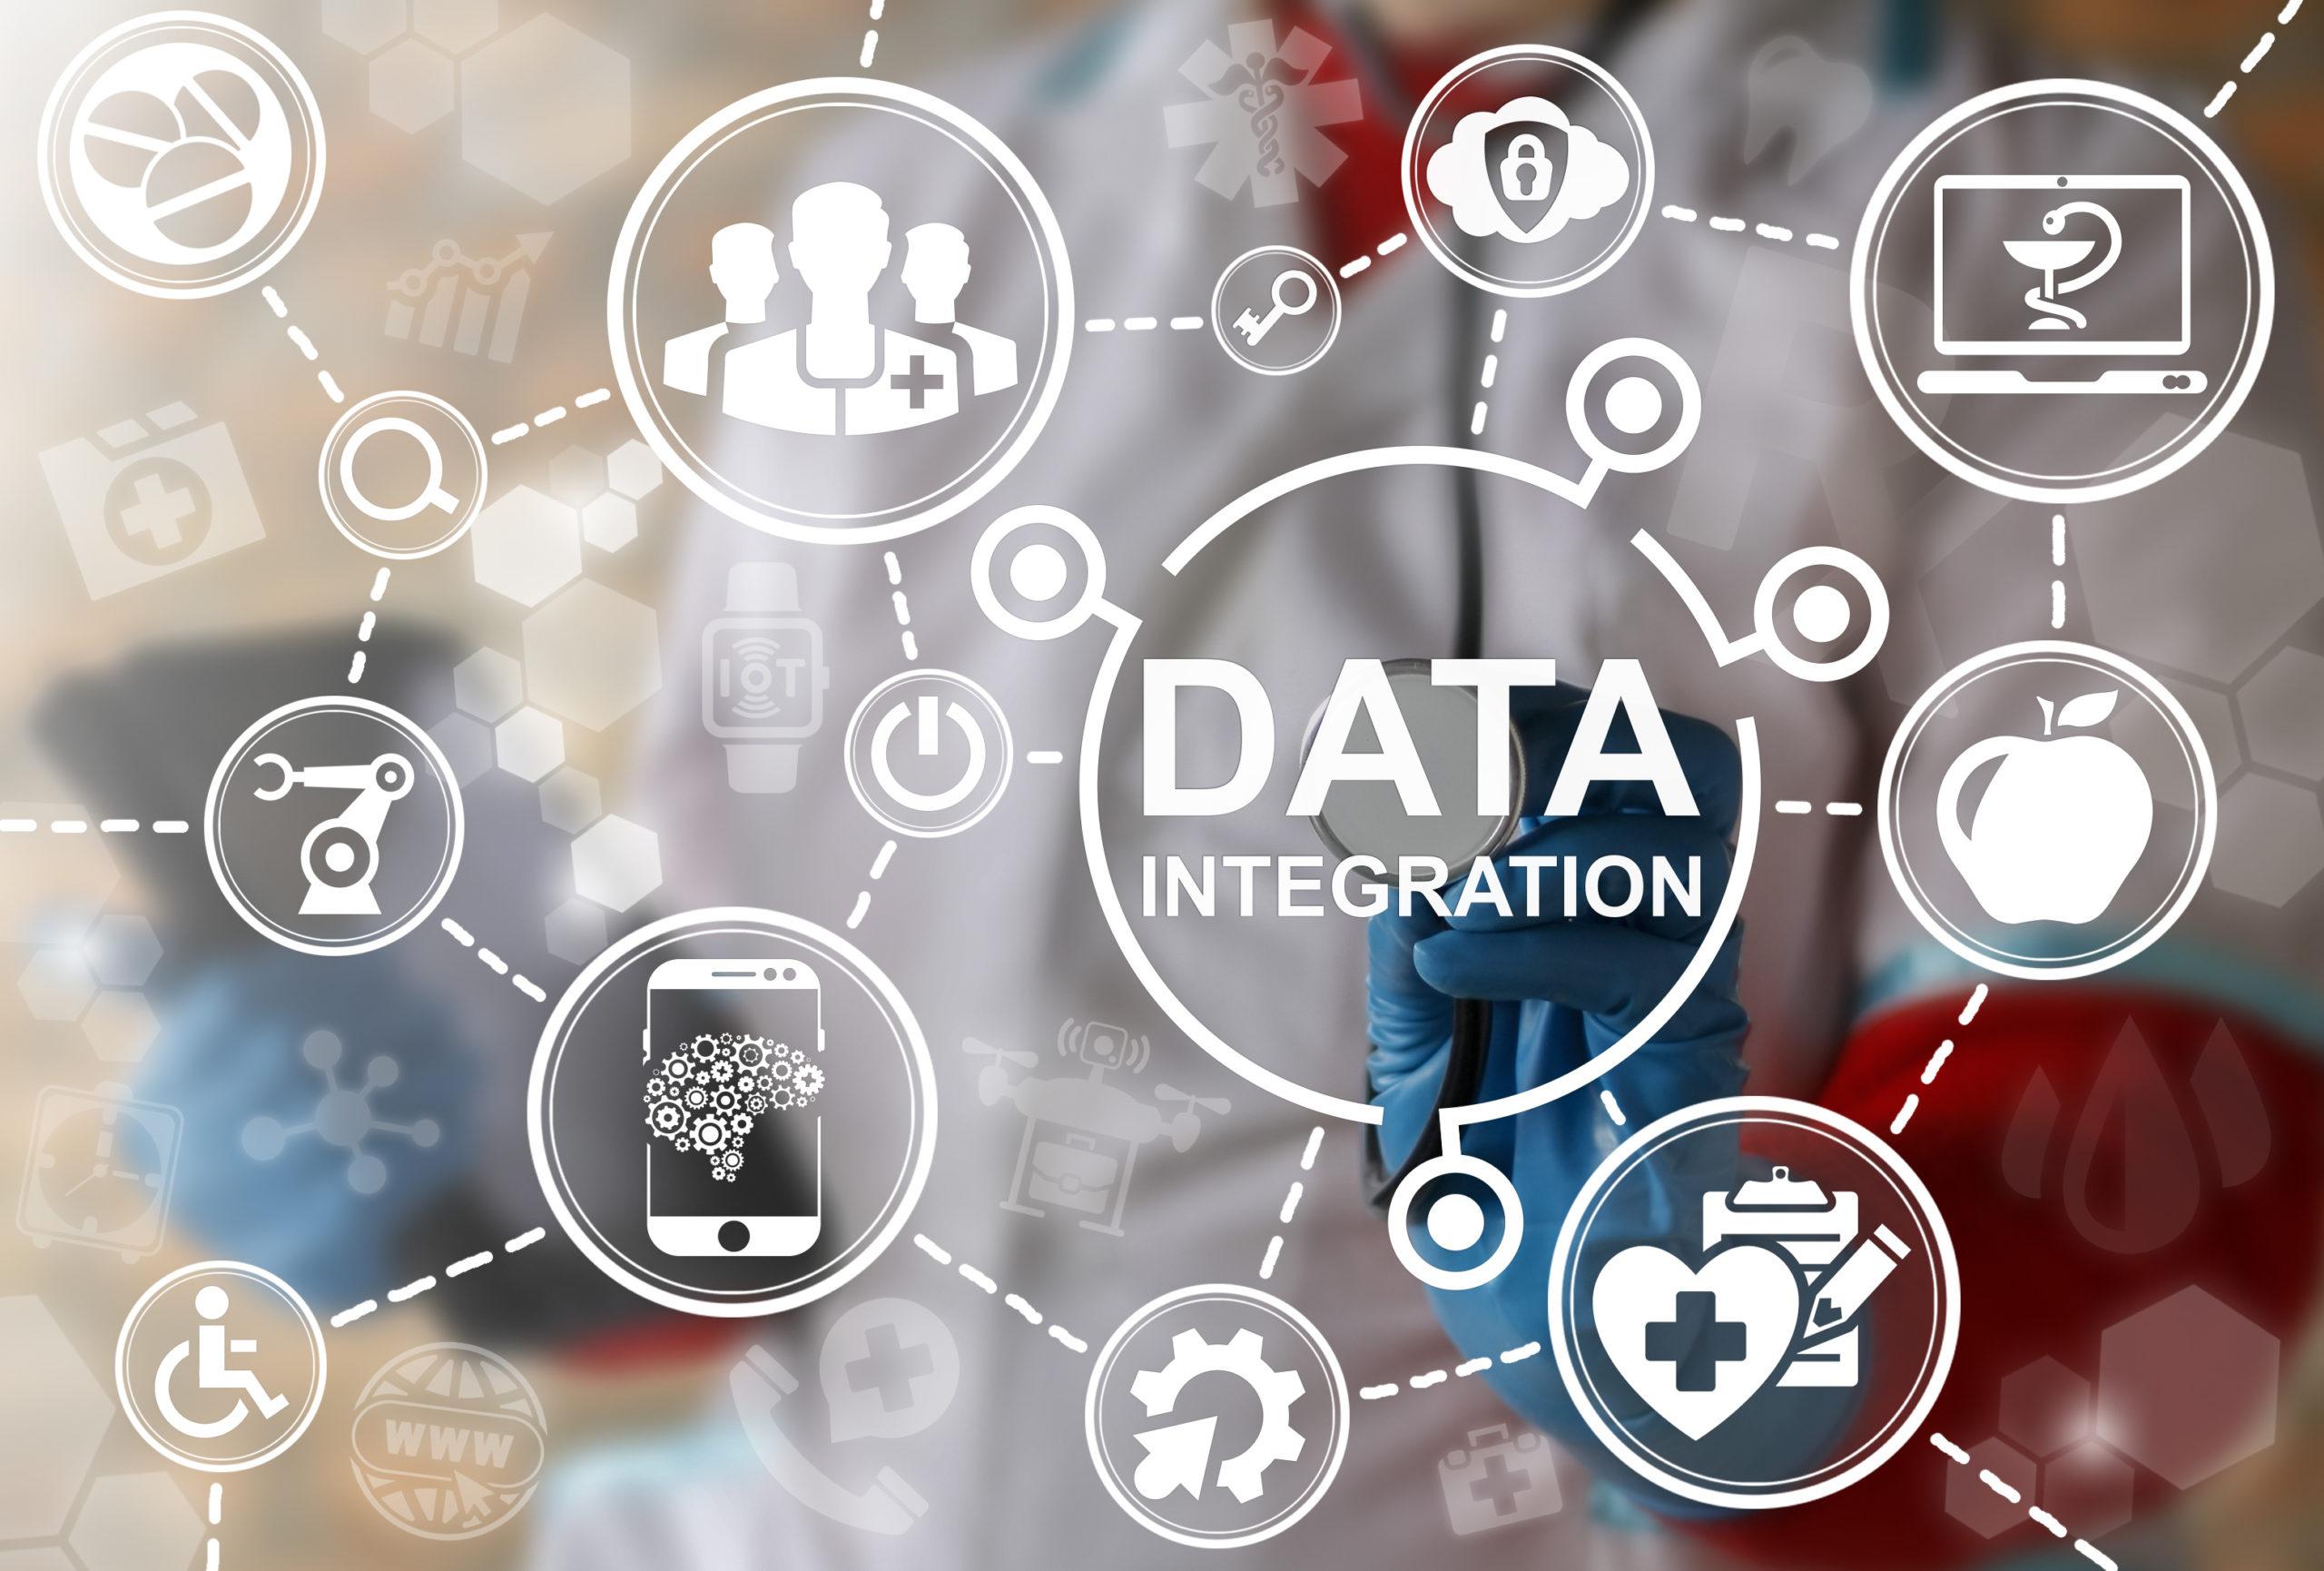 Big data integration medicine concept. Medical information database integrate. Health care server cloud integrated. IT, Smart, IoT, Computing, Robotic healthy web technology